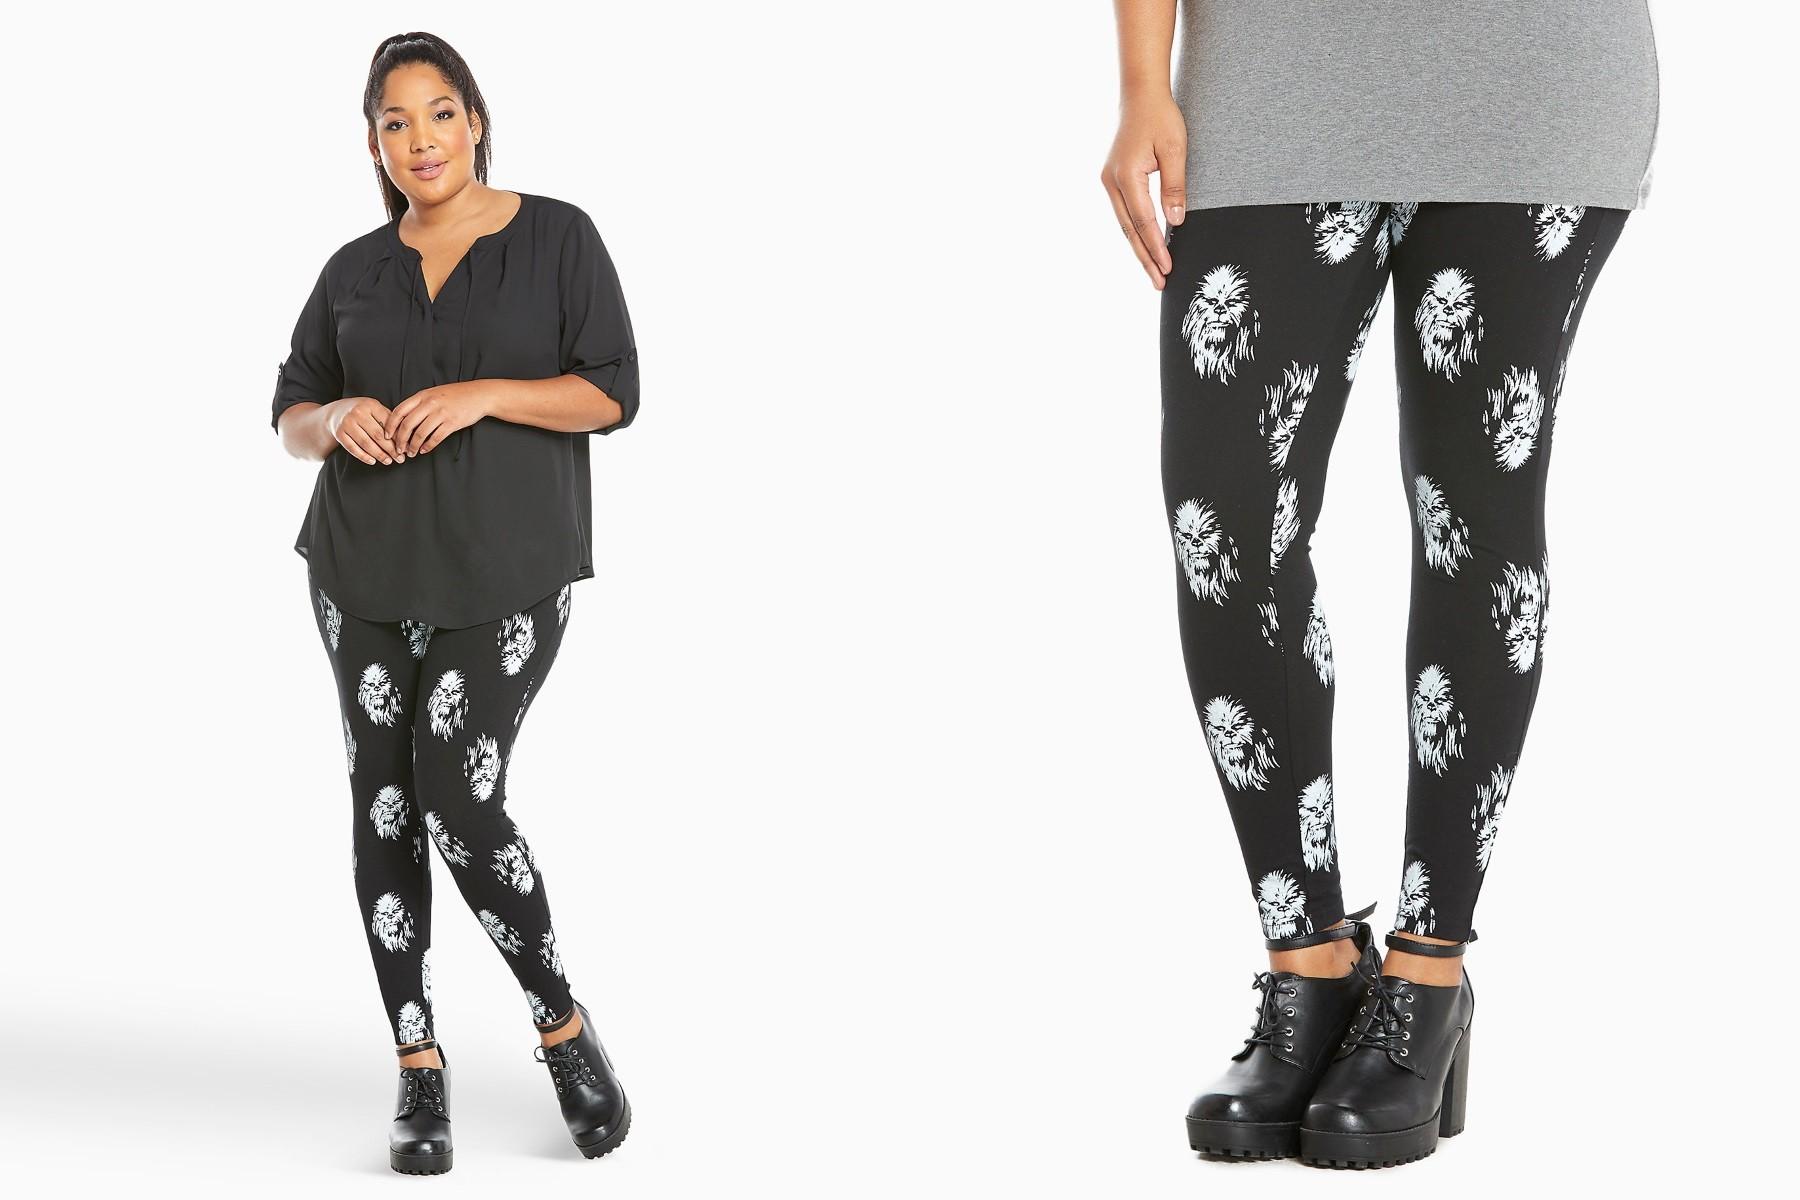 Torrid - women's plus size Chewbacca leggings